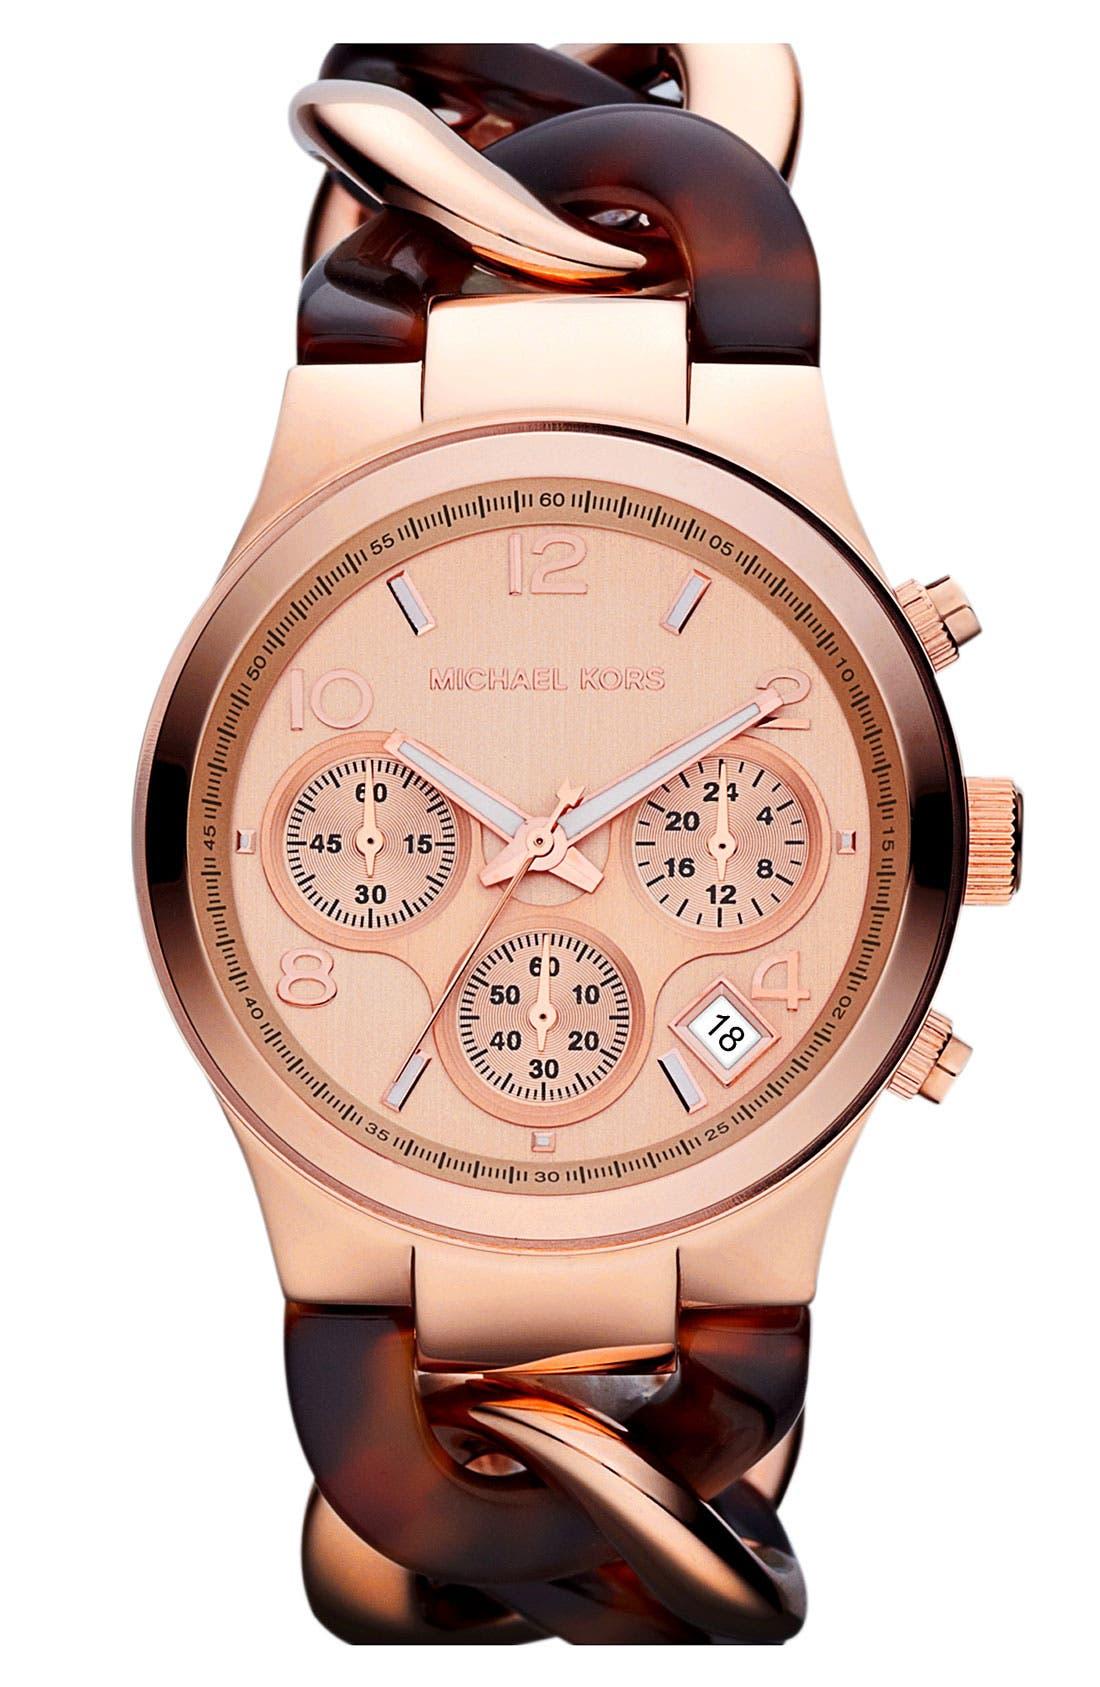 Main Image - Michael Kors Chain Bracelet Chronograph Watch, 38mm